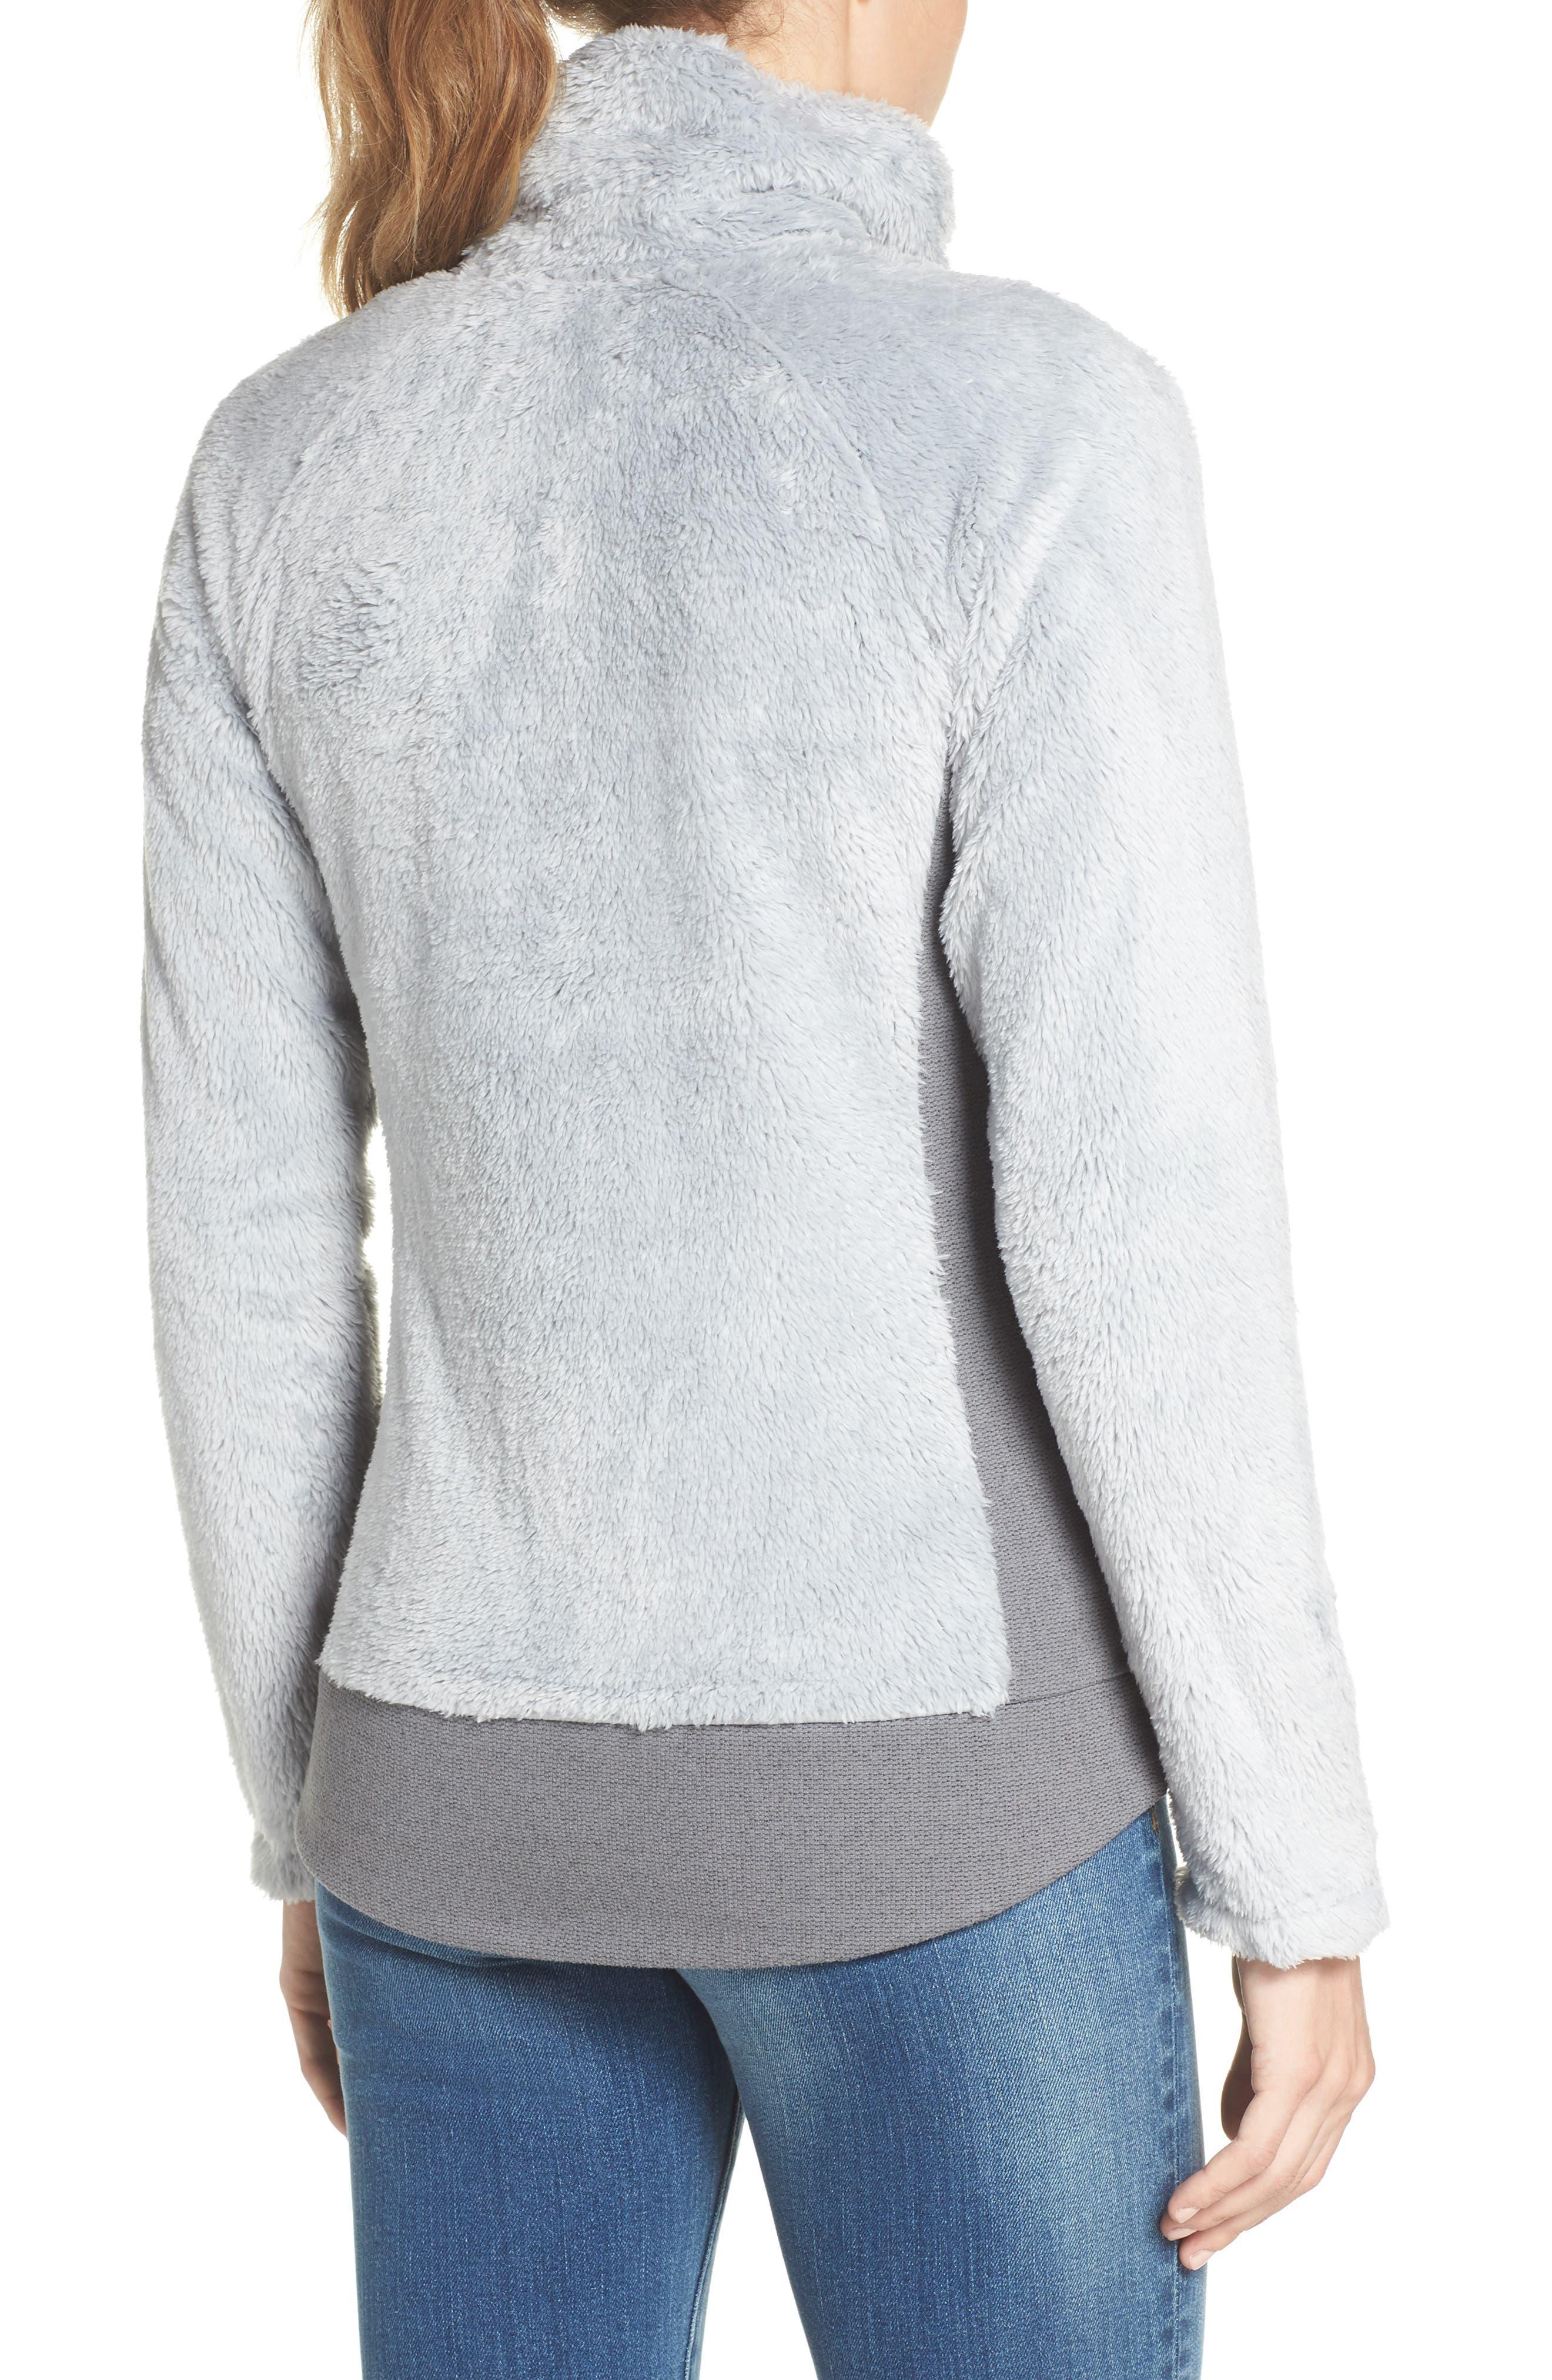 Furry Fleece Jacket,                             Alternate thumbnail 2, color,                             High Rise Grey